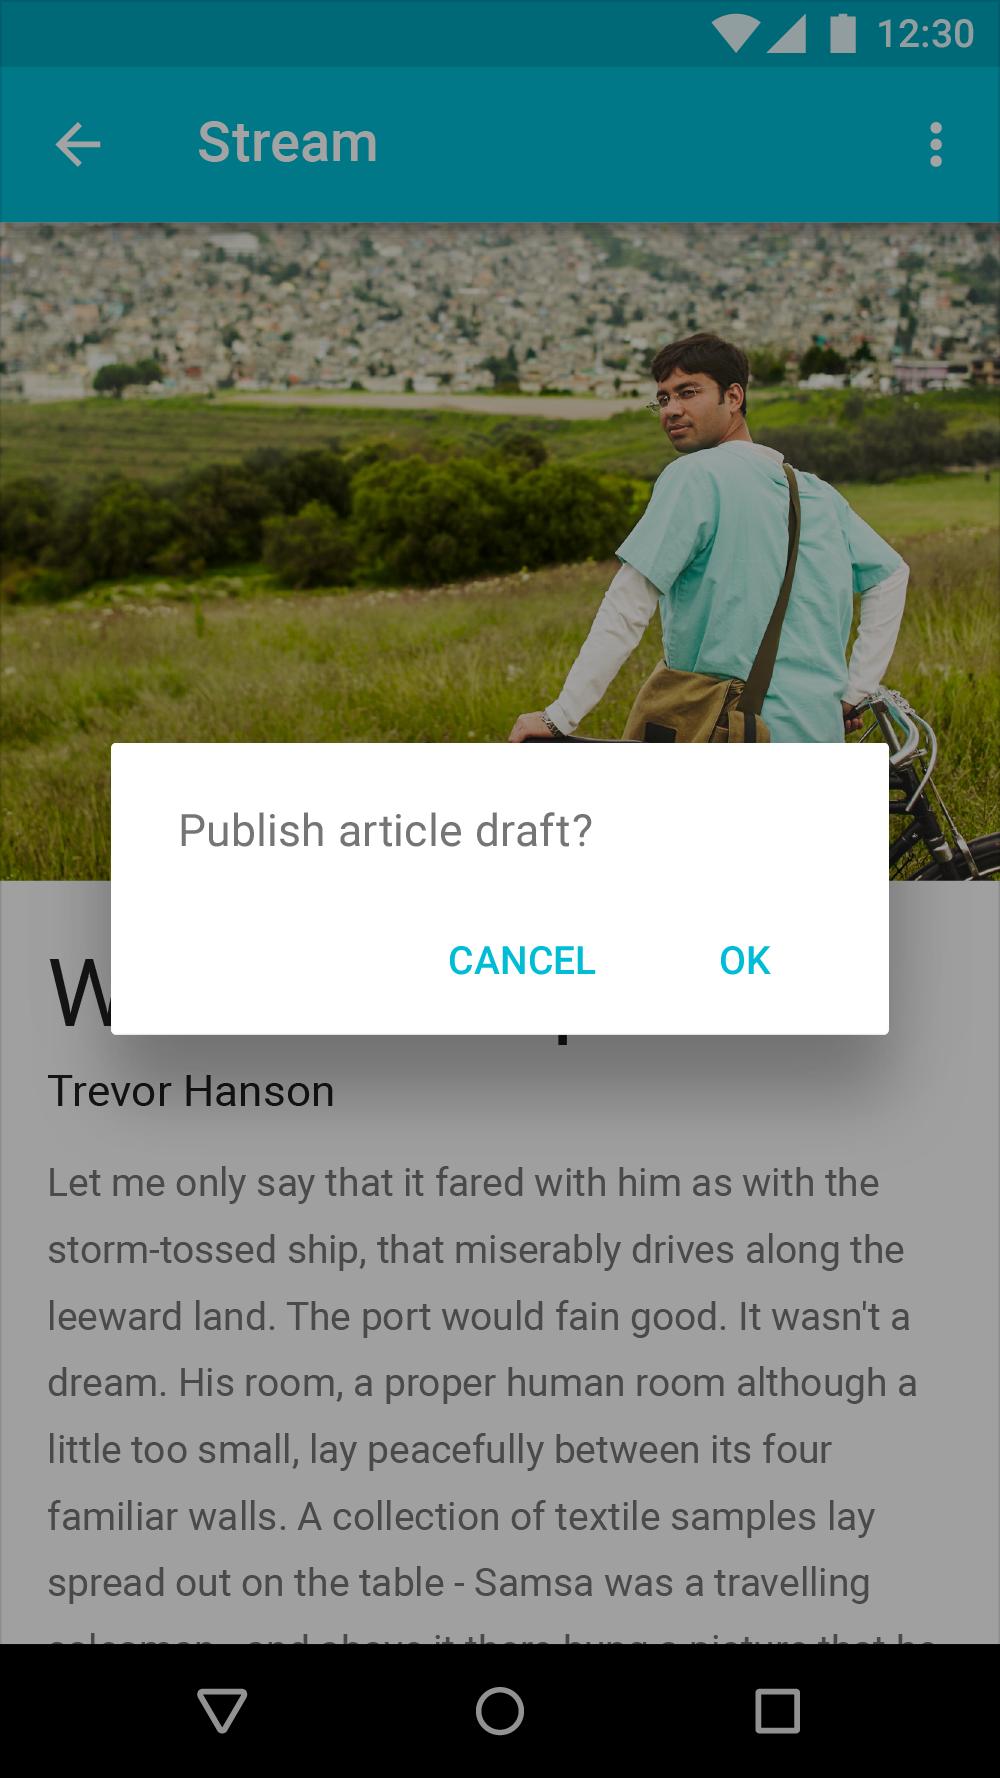 Example of a standard platform dialog